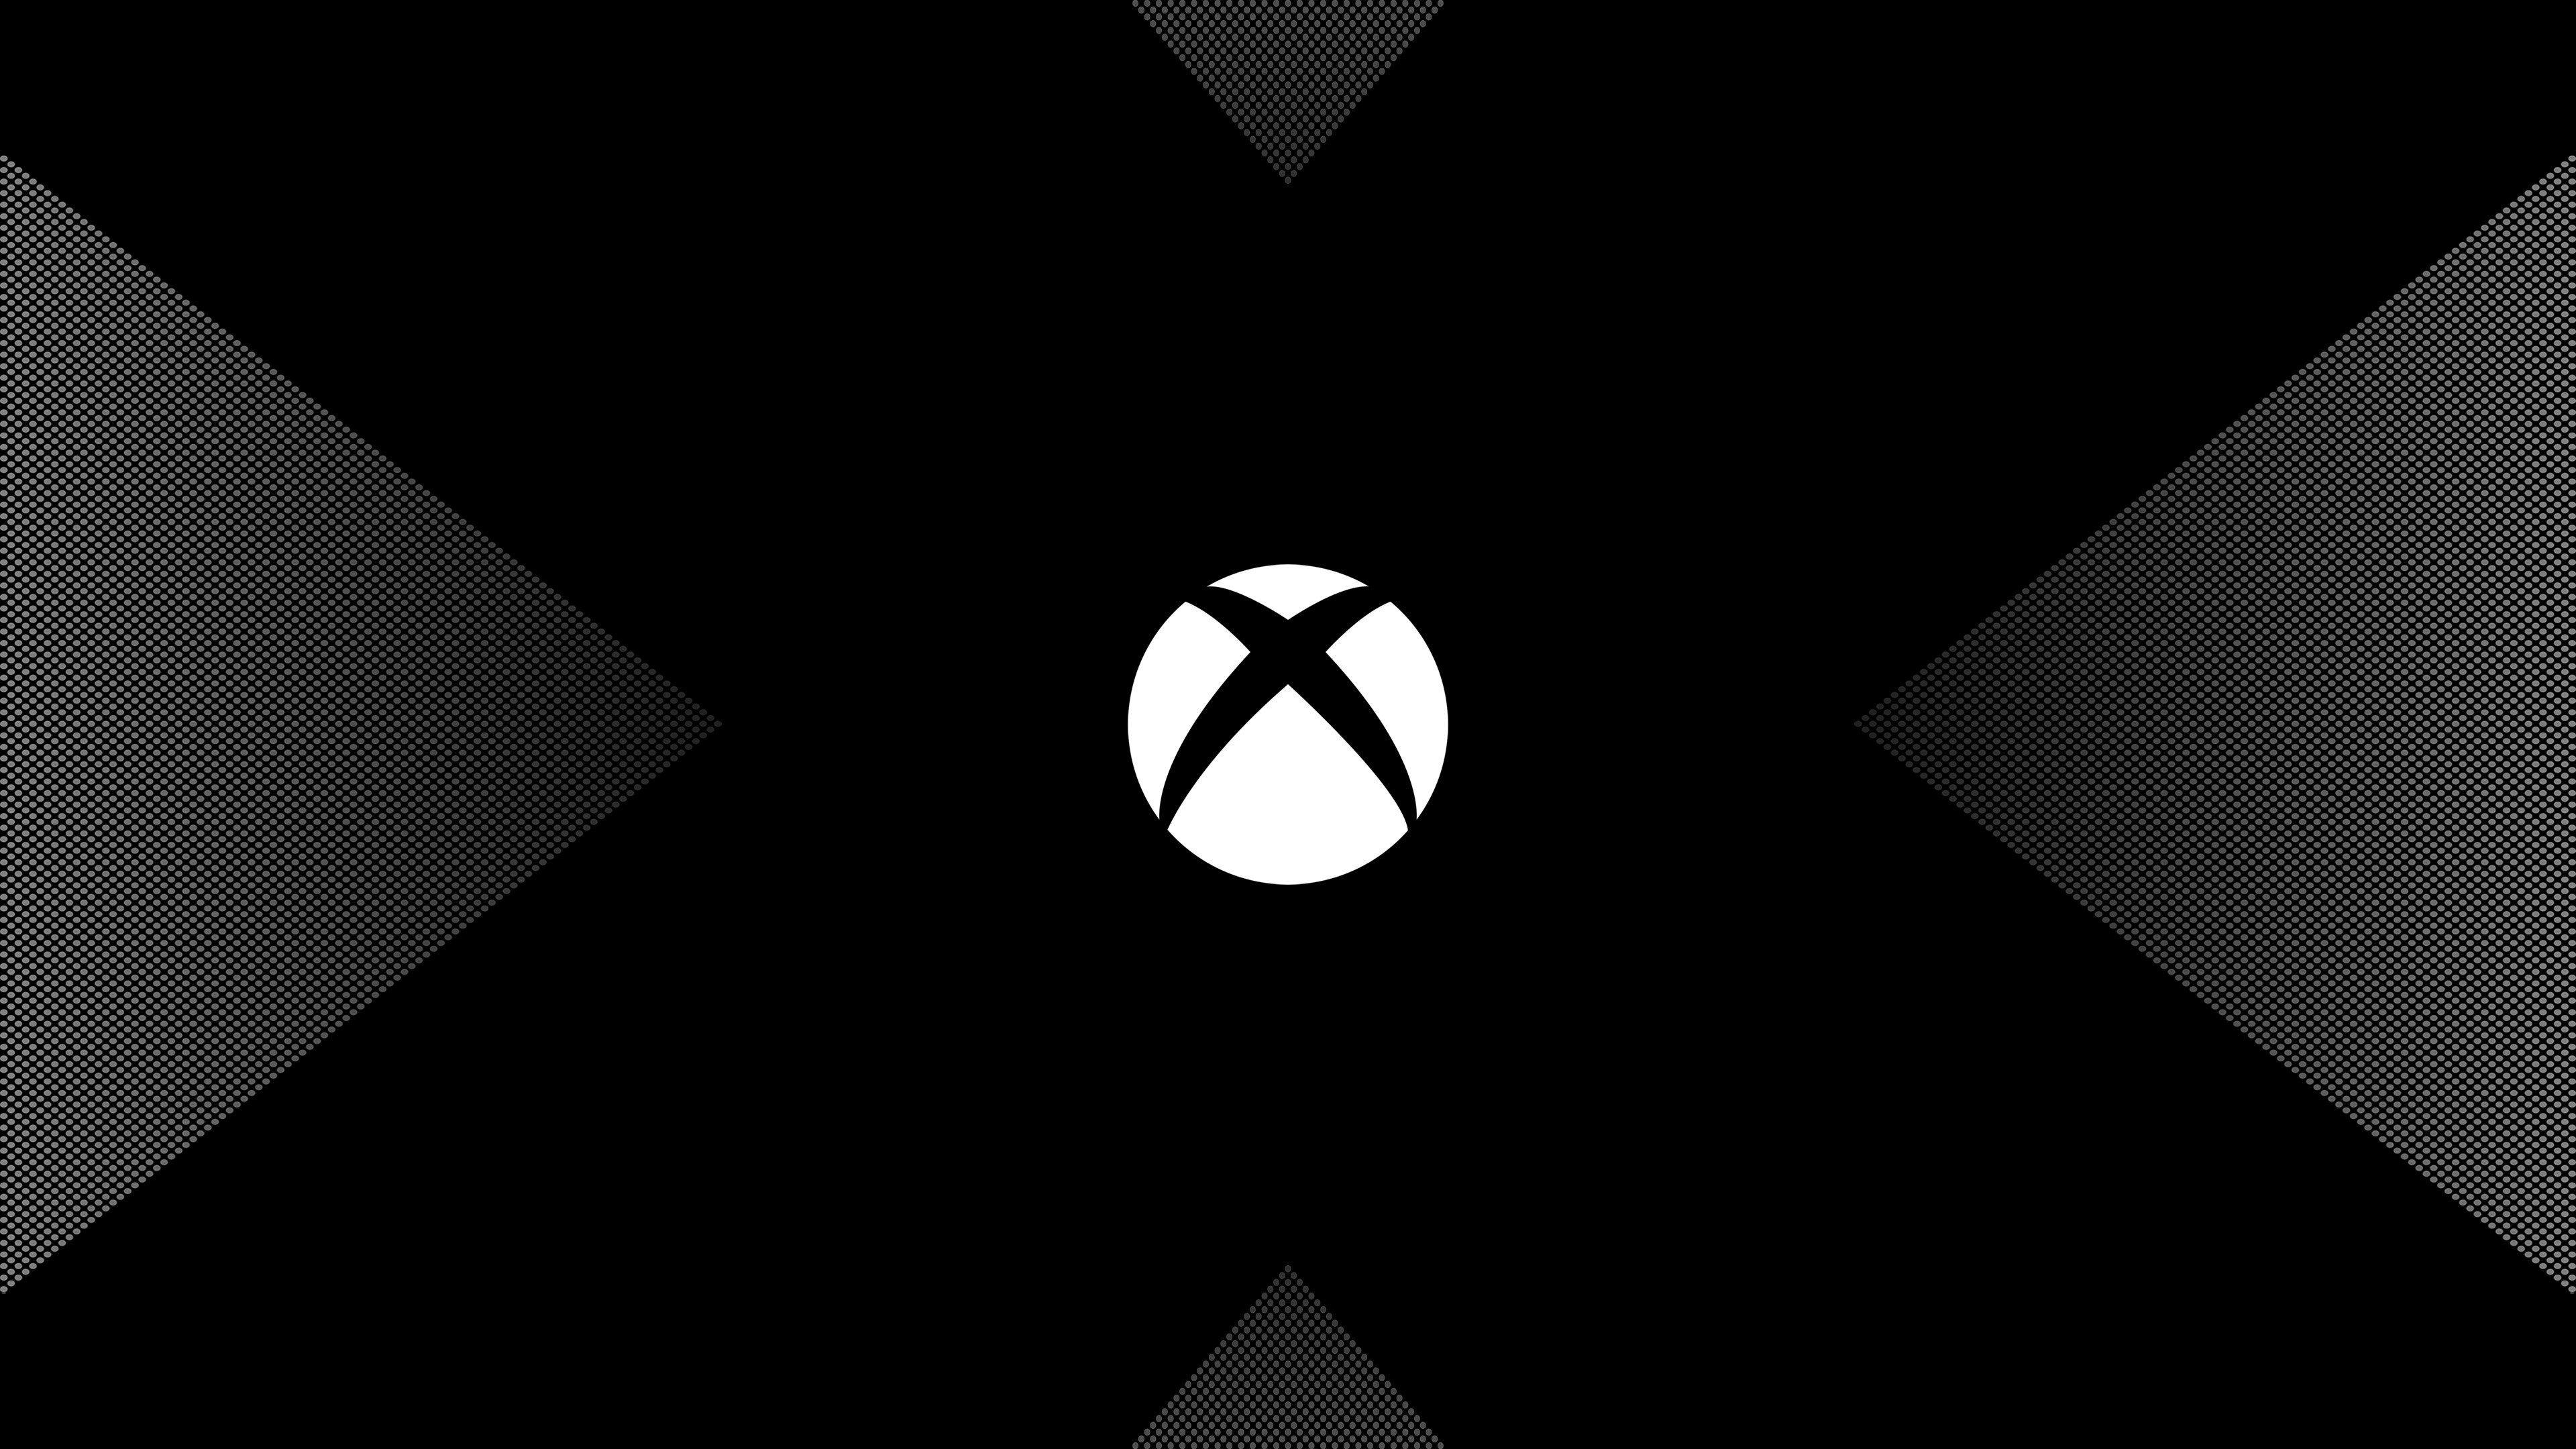 3840x2160 Xbox One X 4k New Hd Pc Wallpaper Xbox One Xbox Xbox Controller